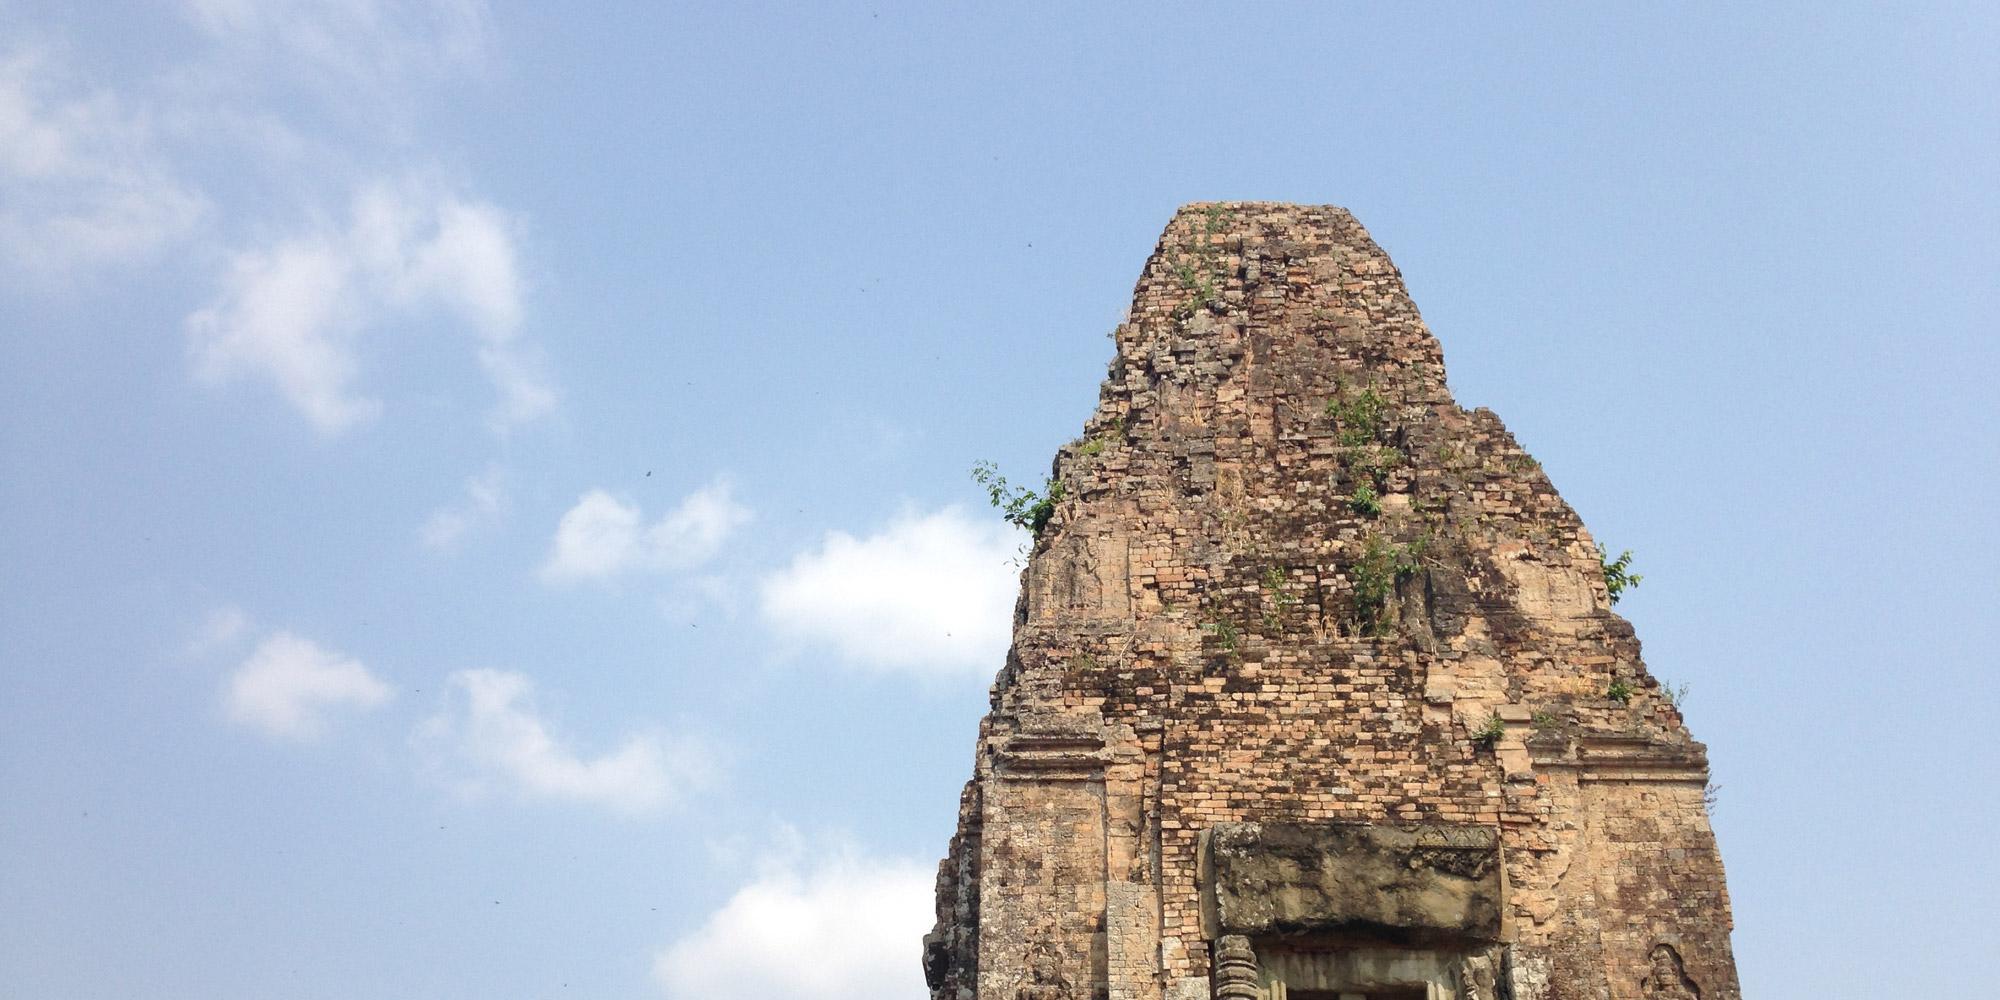 Siam reap sky